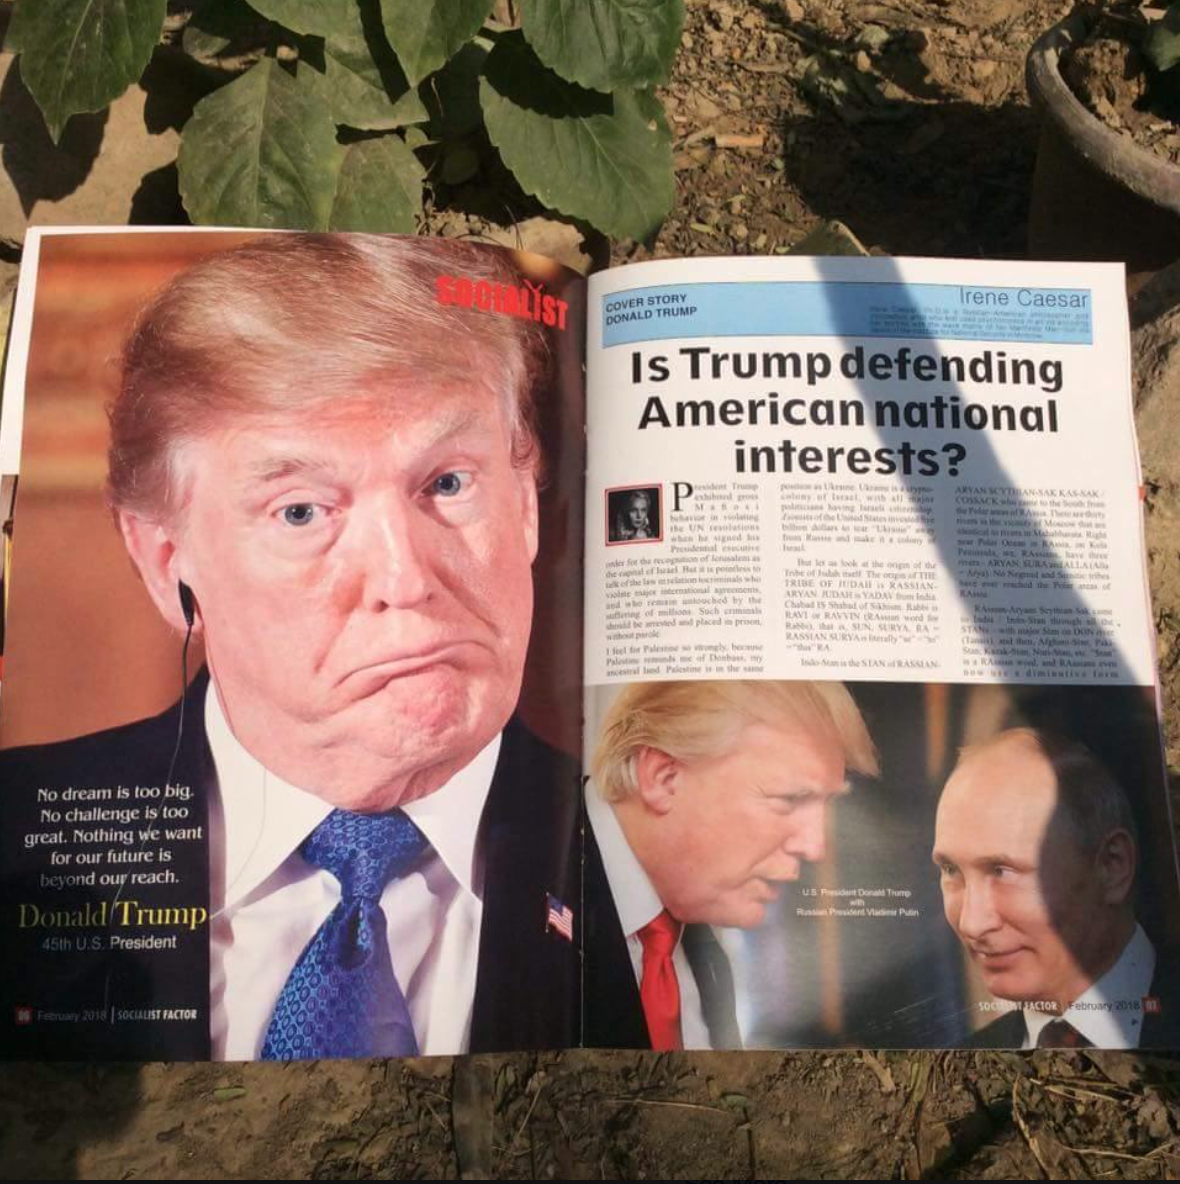 2018_2_IRENE_CAESAR_IS_TRUMP_DEFENDING_AMERICAN_NATIONAL_INTERESTS_8